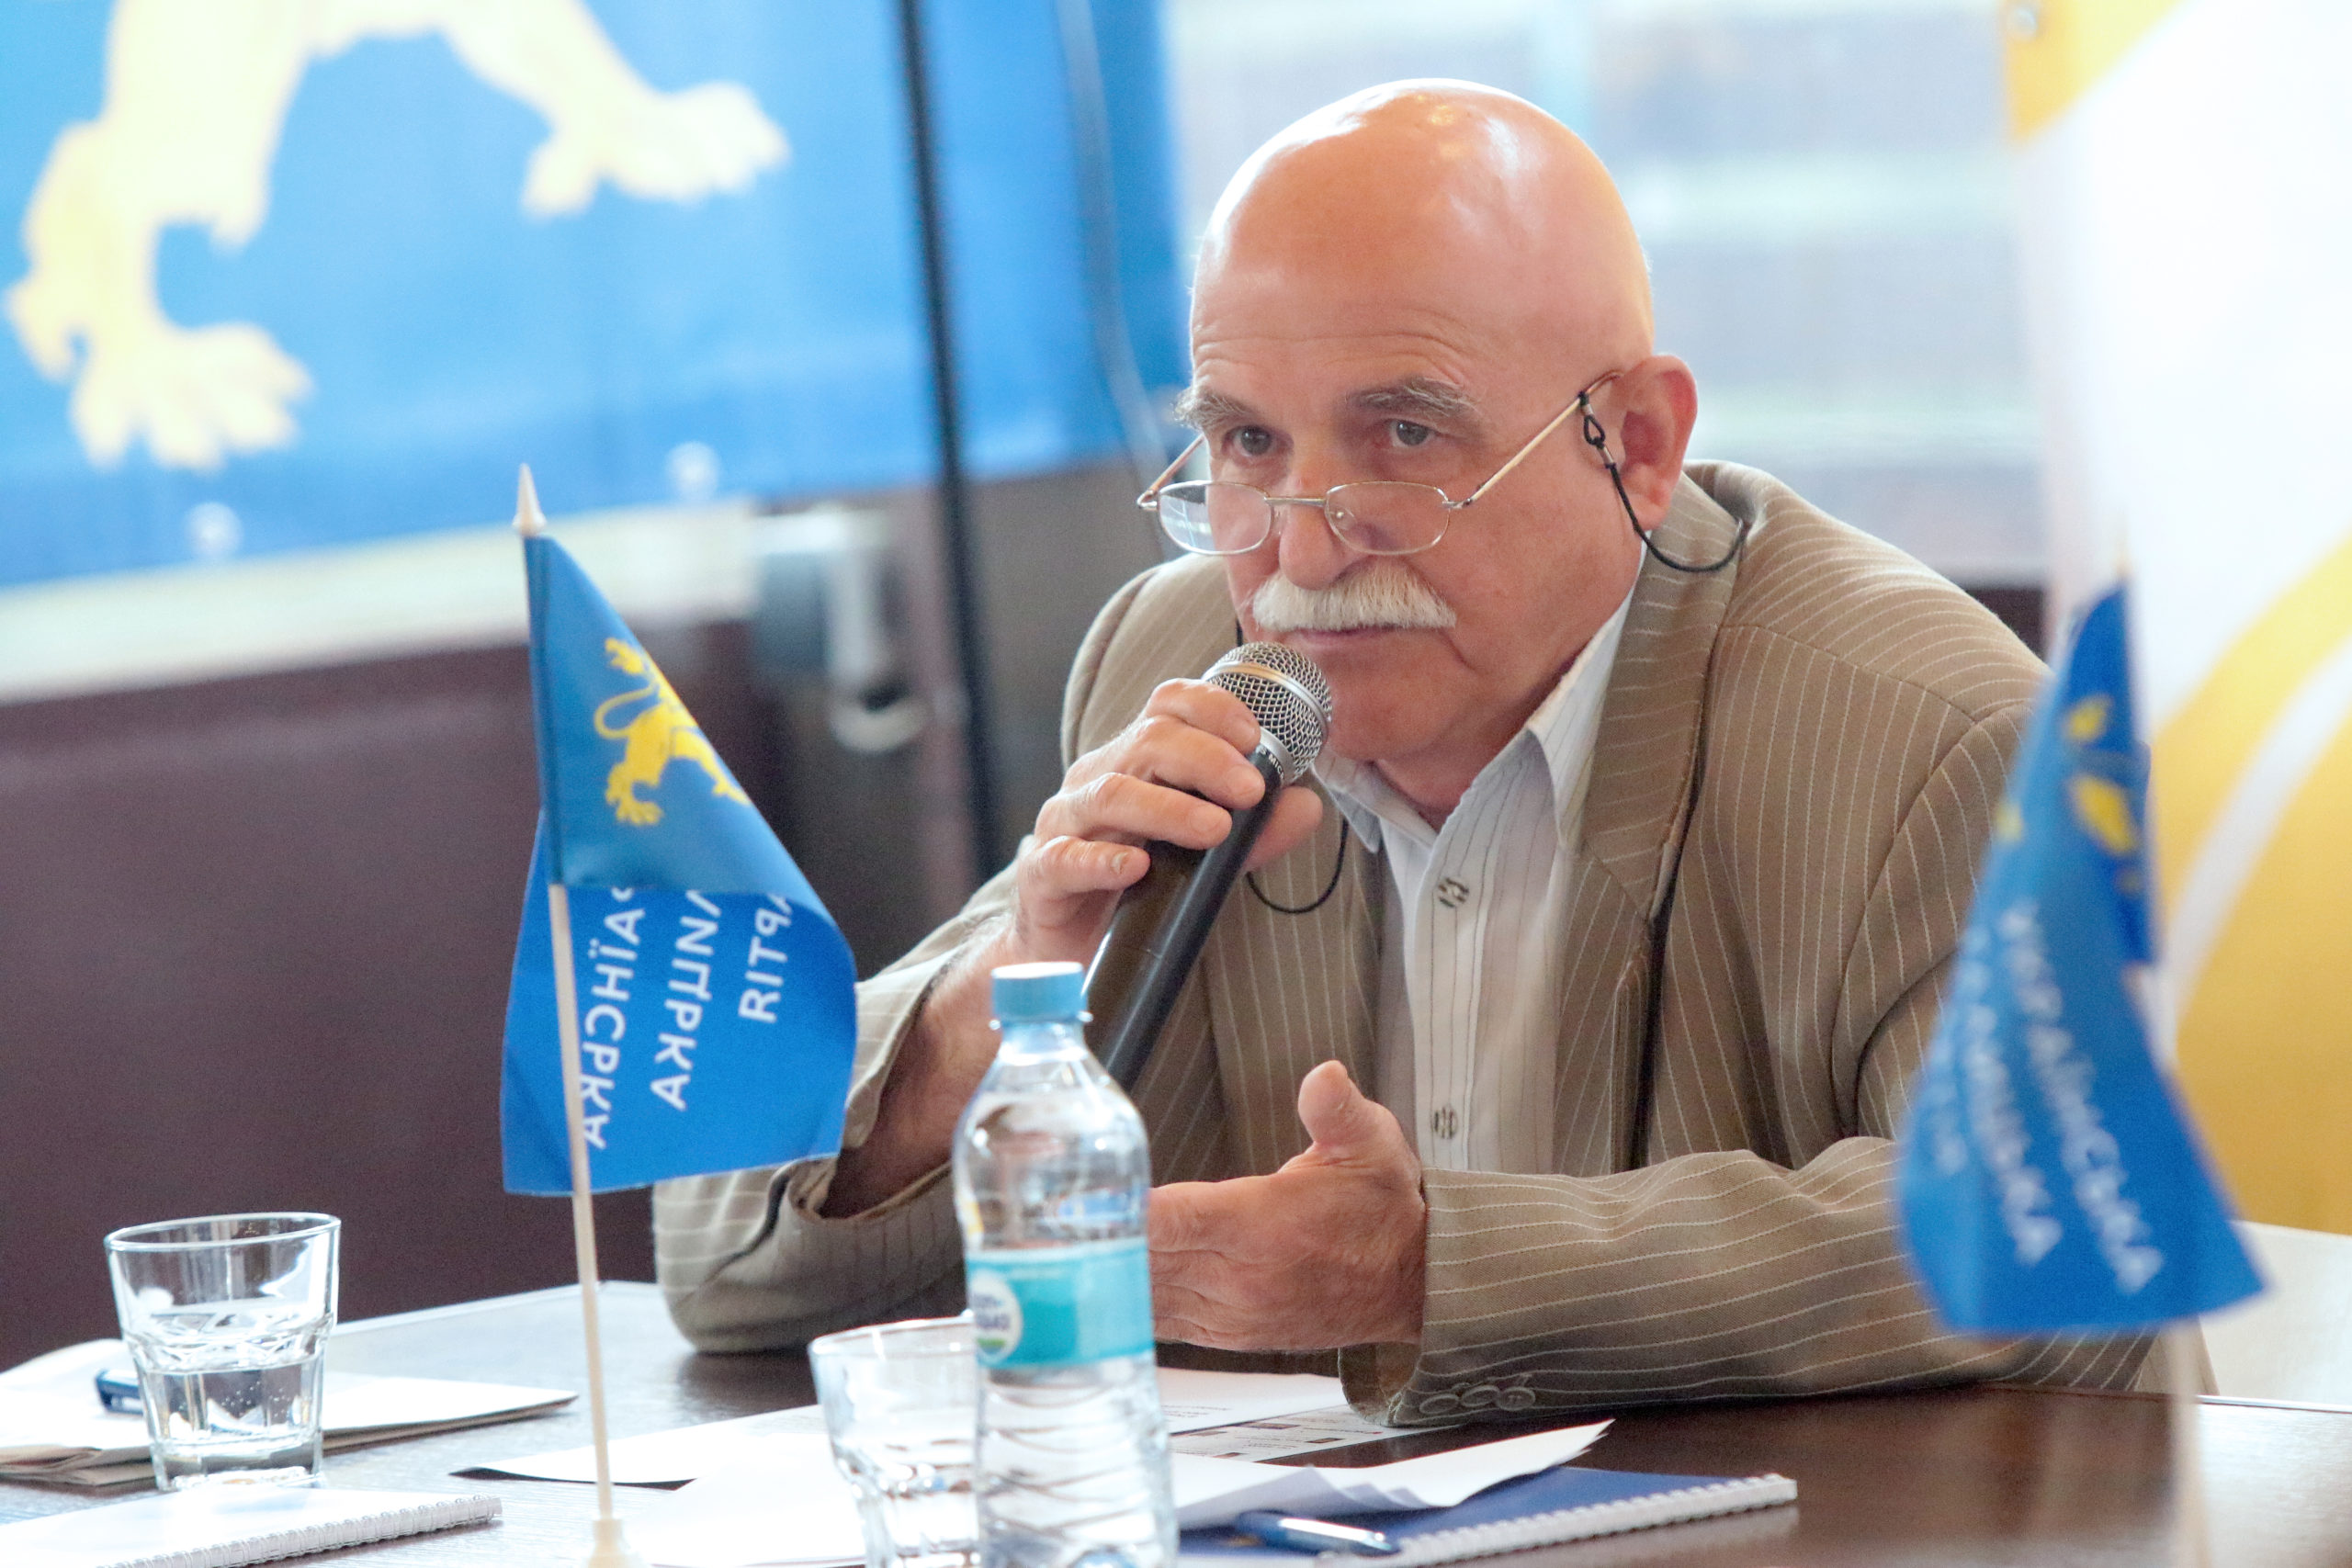 konferentsiia-zlochynni-klany-lvova-trembita-lviv-3-serpnia-2020-3